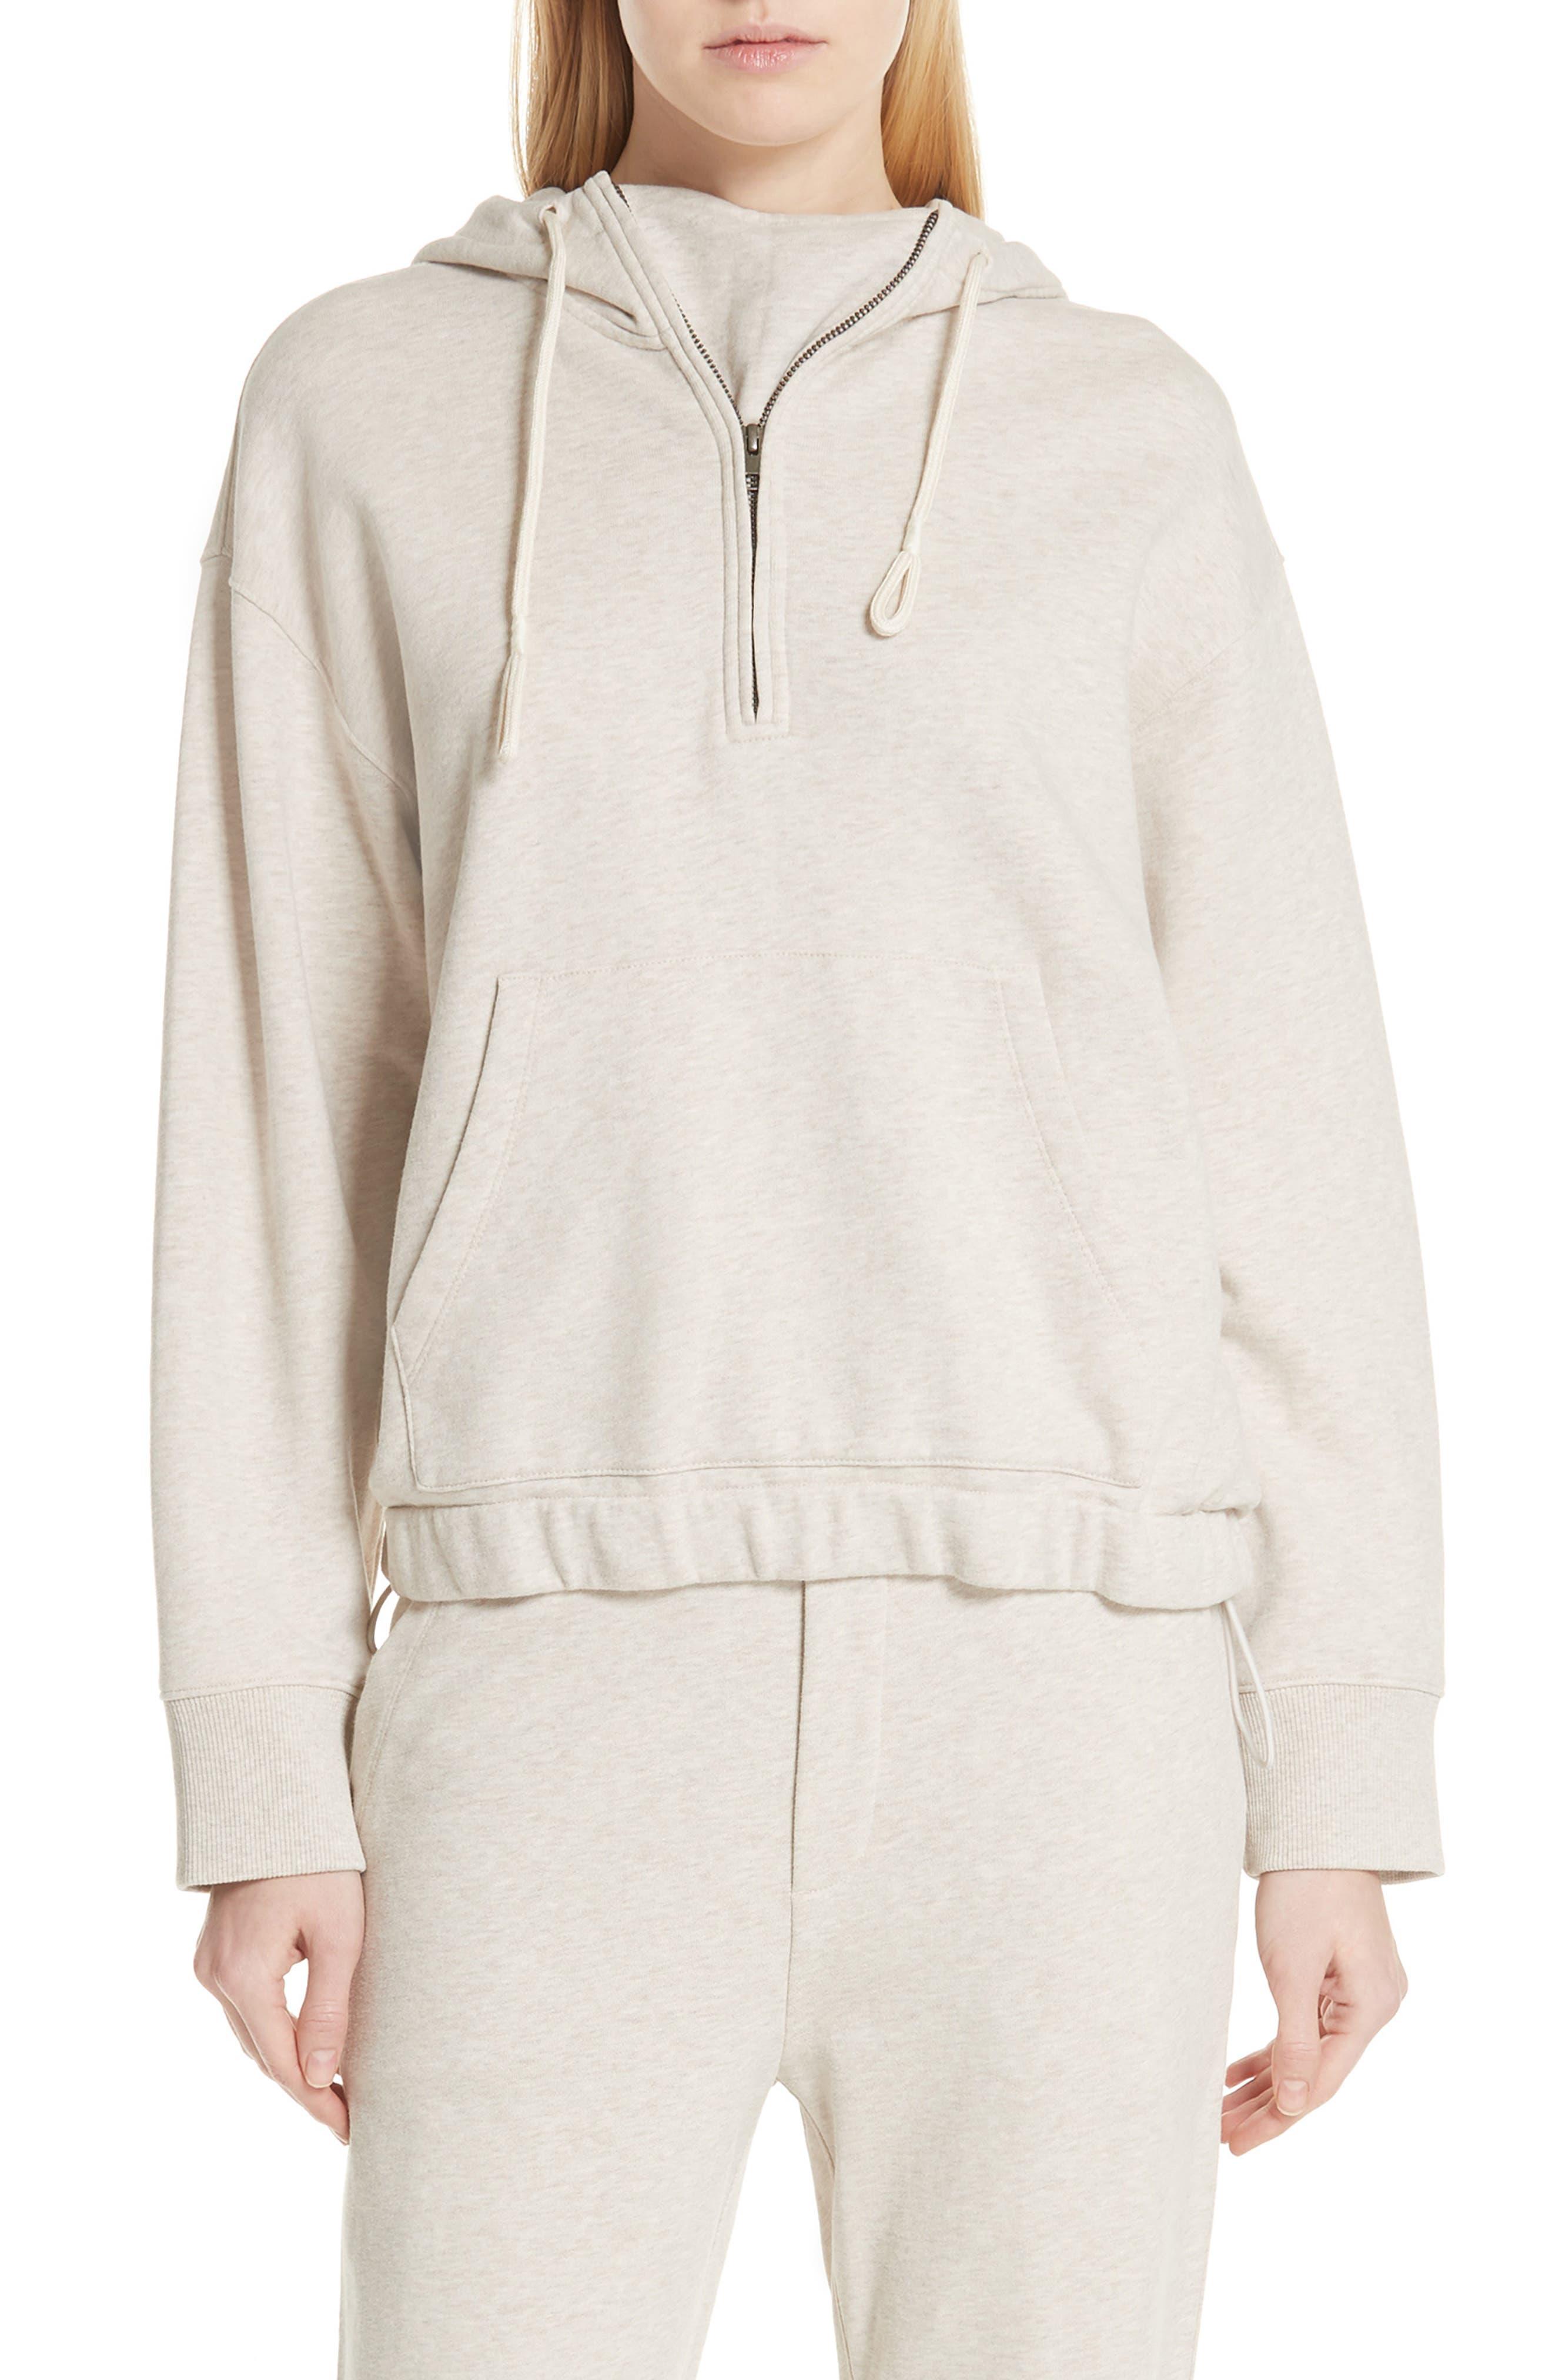 Half Zip Cotton Hoodie Sweatshirt,                             Main thumbnail 1, color,                             255